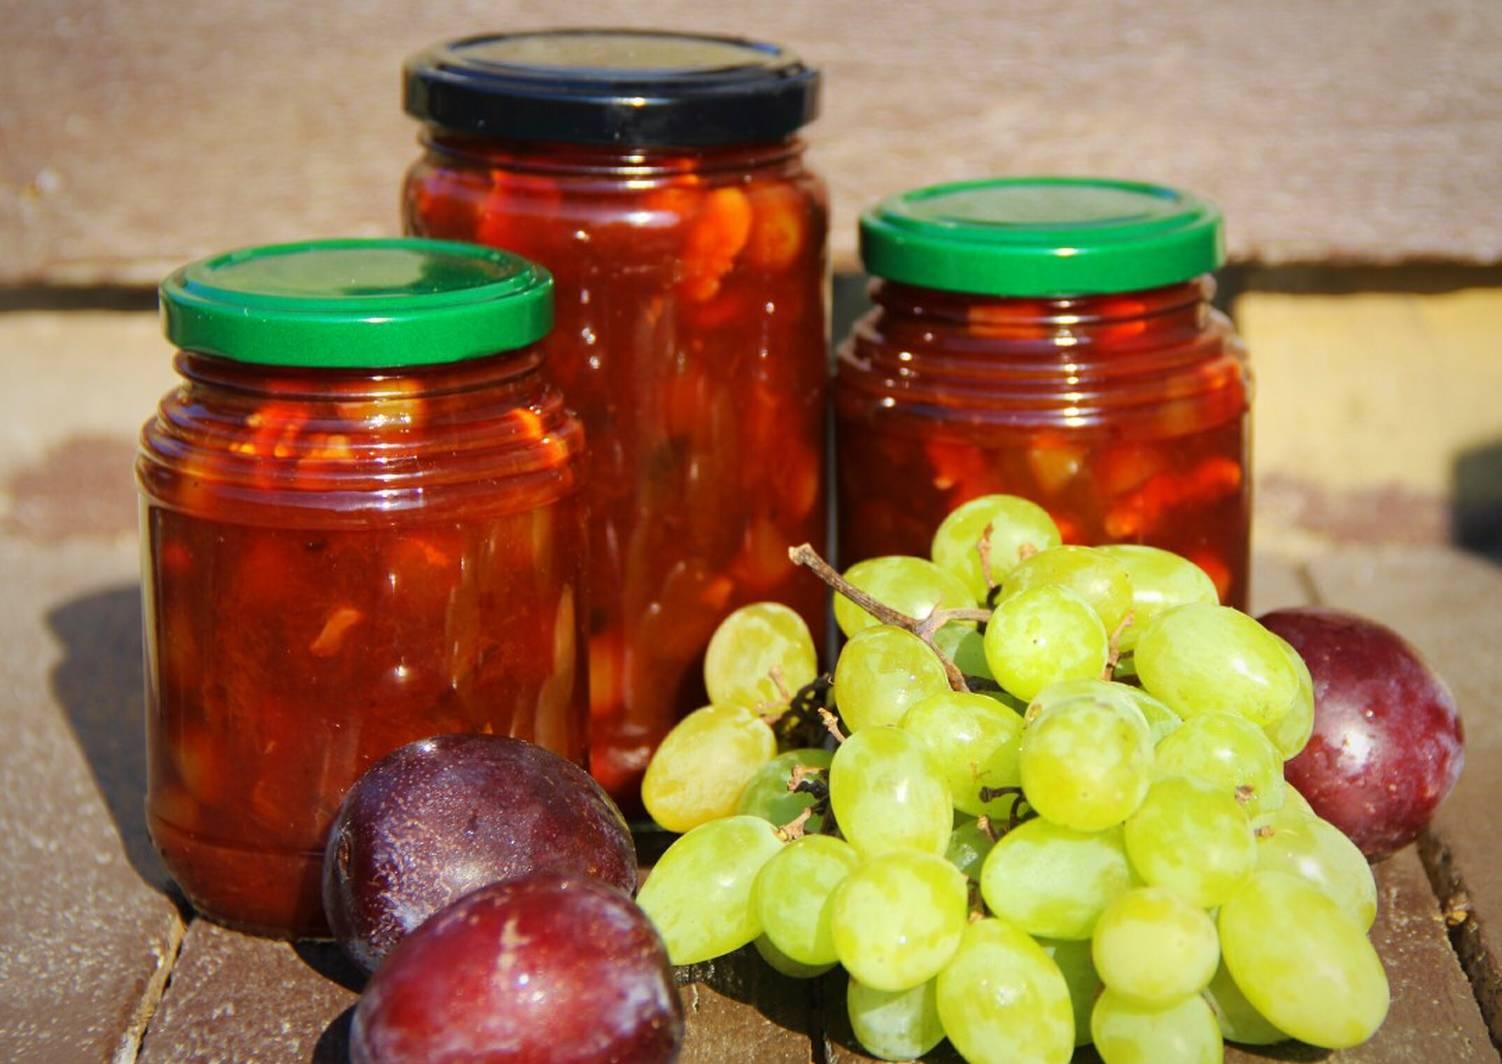 Компот из винограда и яблок на зиму без стерилизации - рецепт с фото пошагово